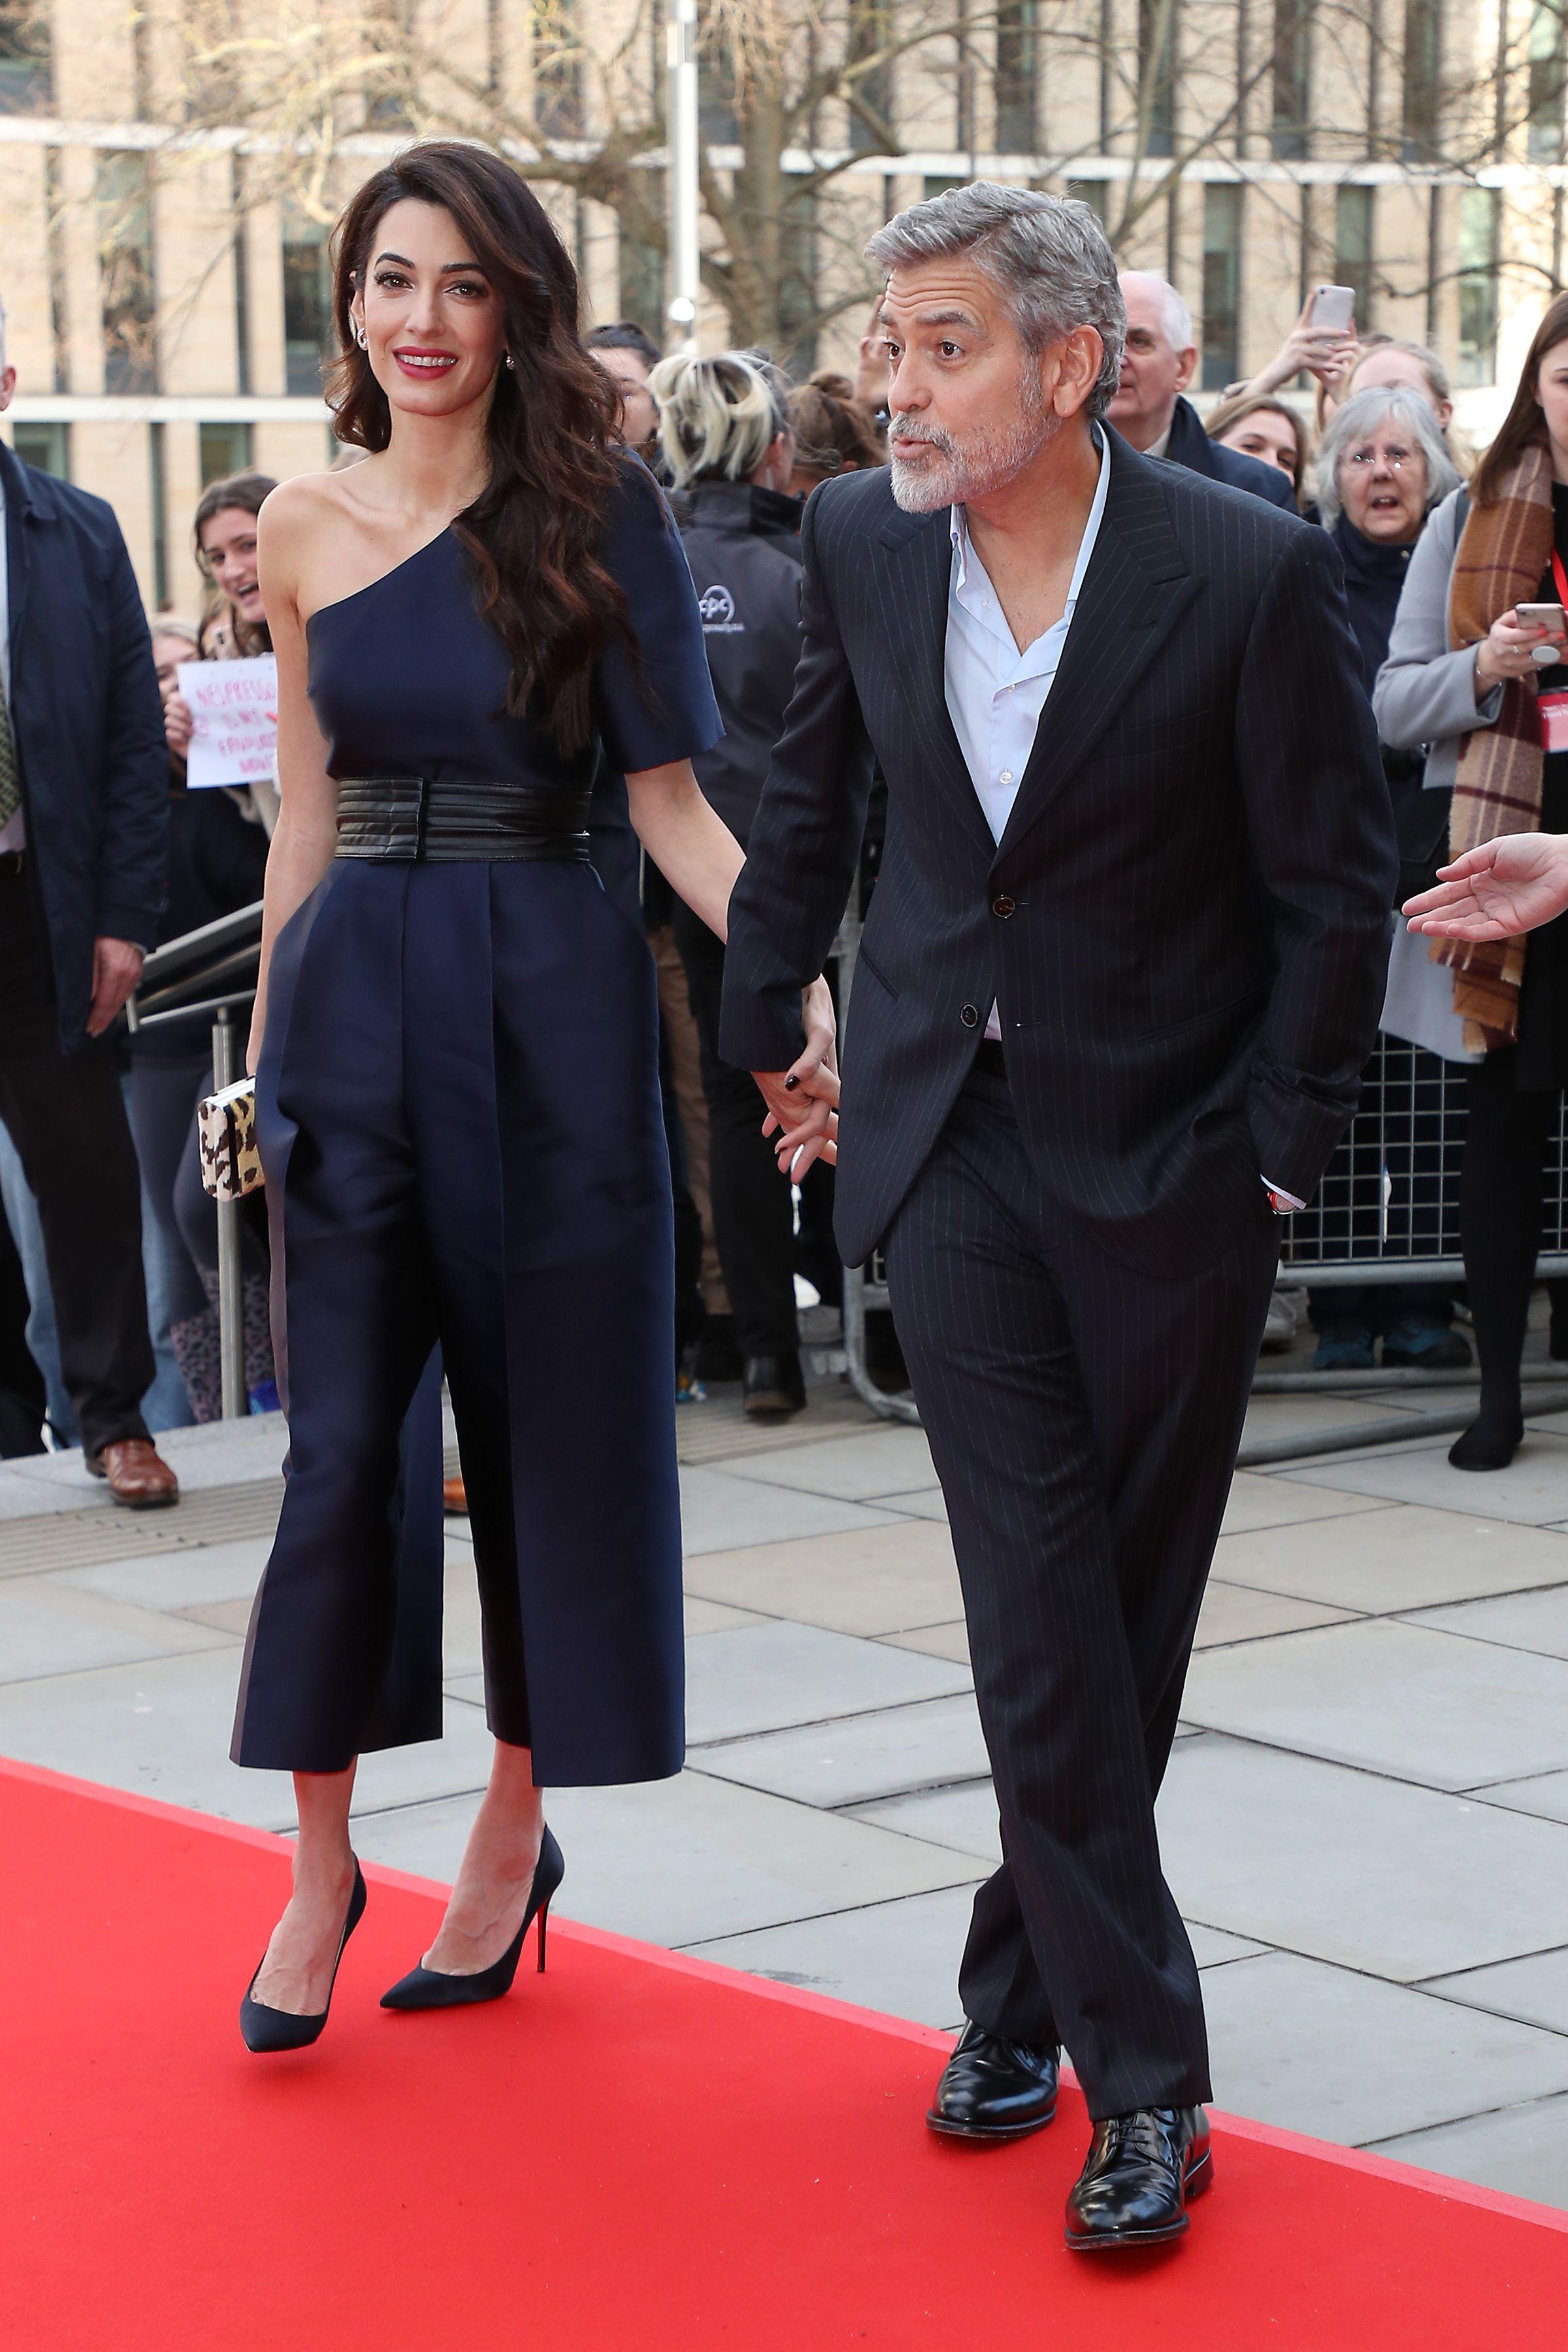 Amal Clooney Best Style Moments , Amal Clooney Fashion Photos